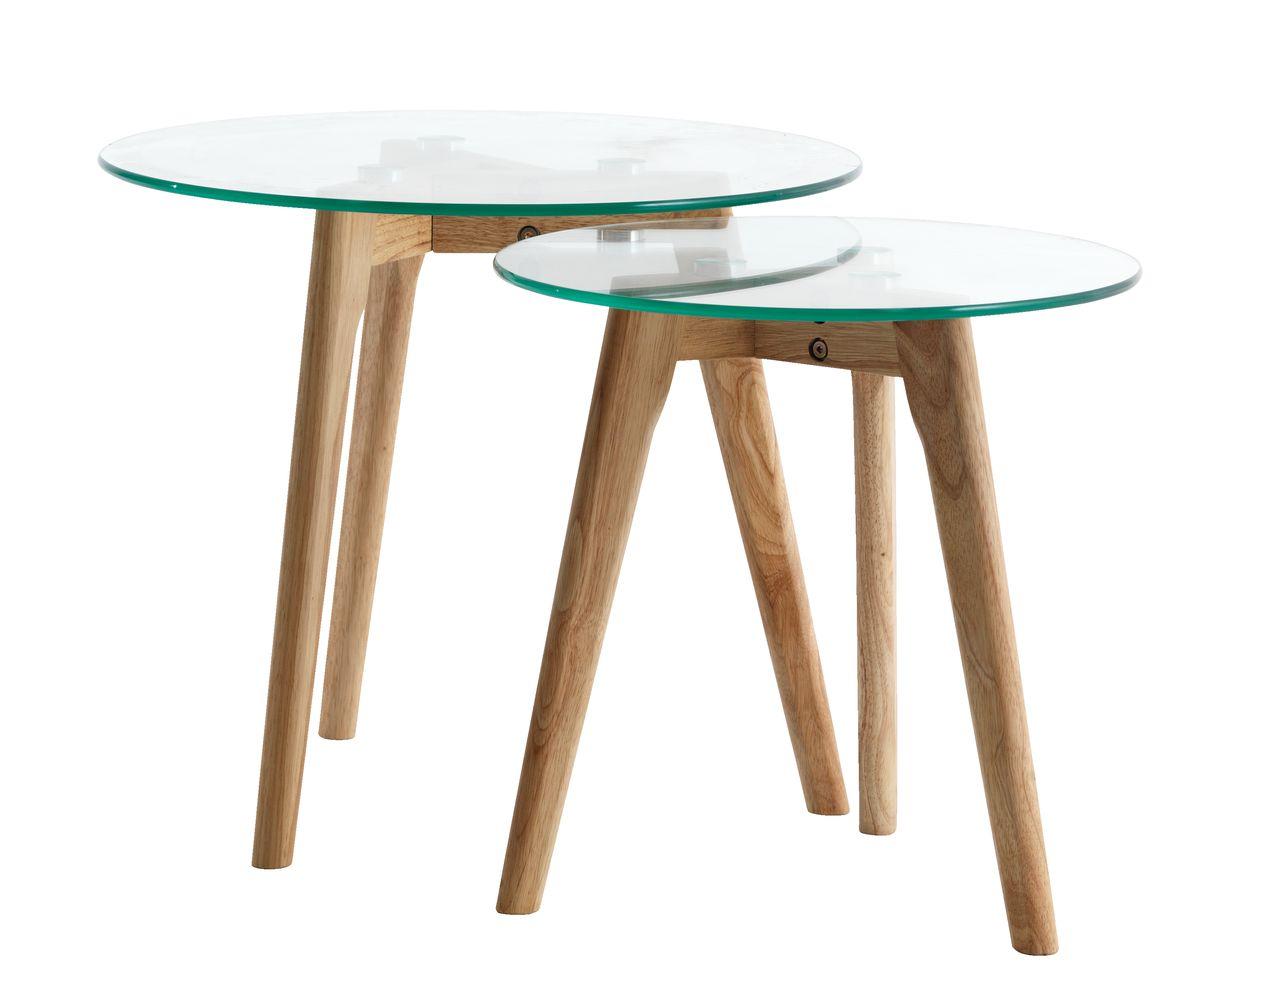 Kitchen Island Jysk set of tables ordrup glass/oak | jysk